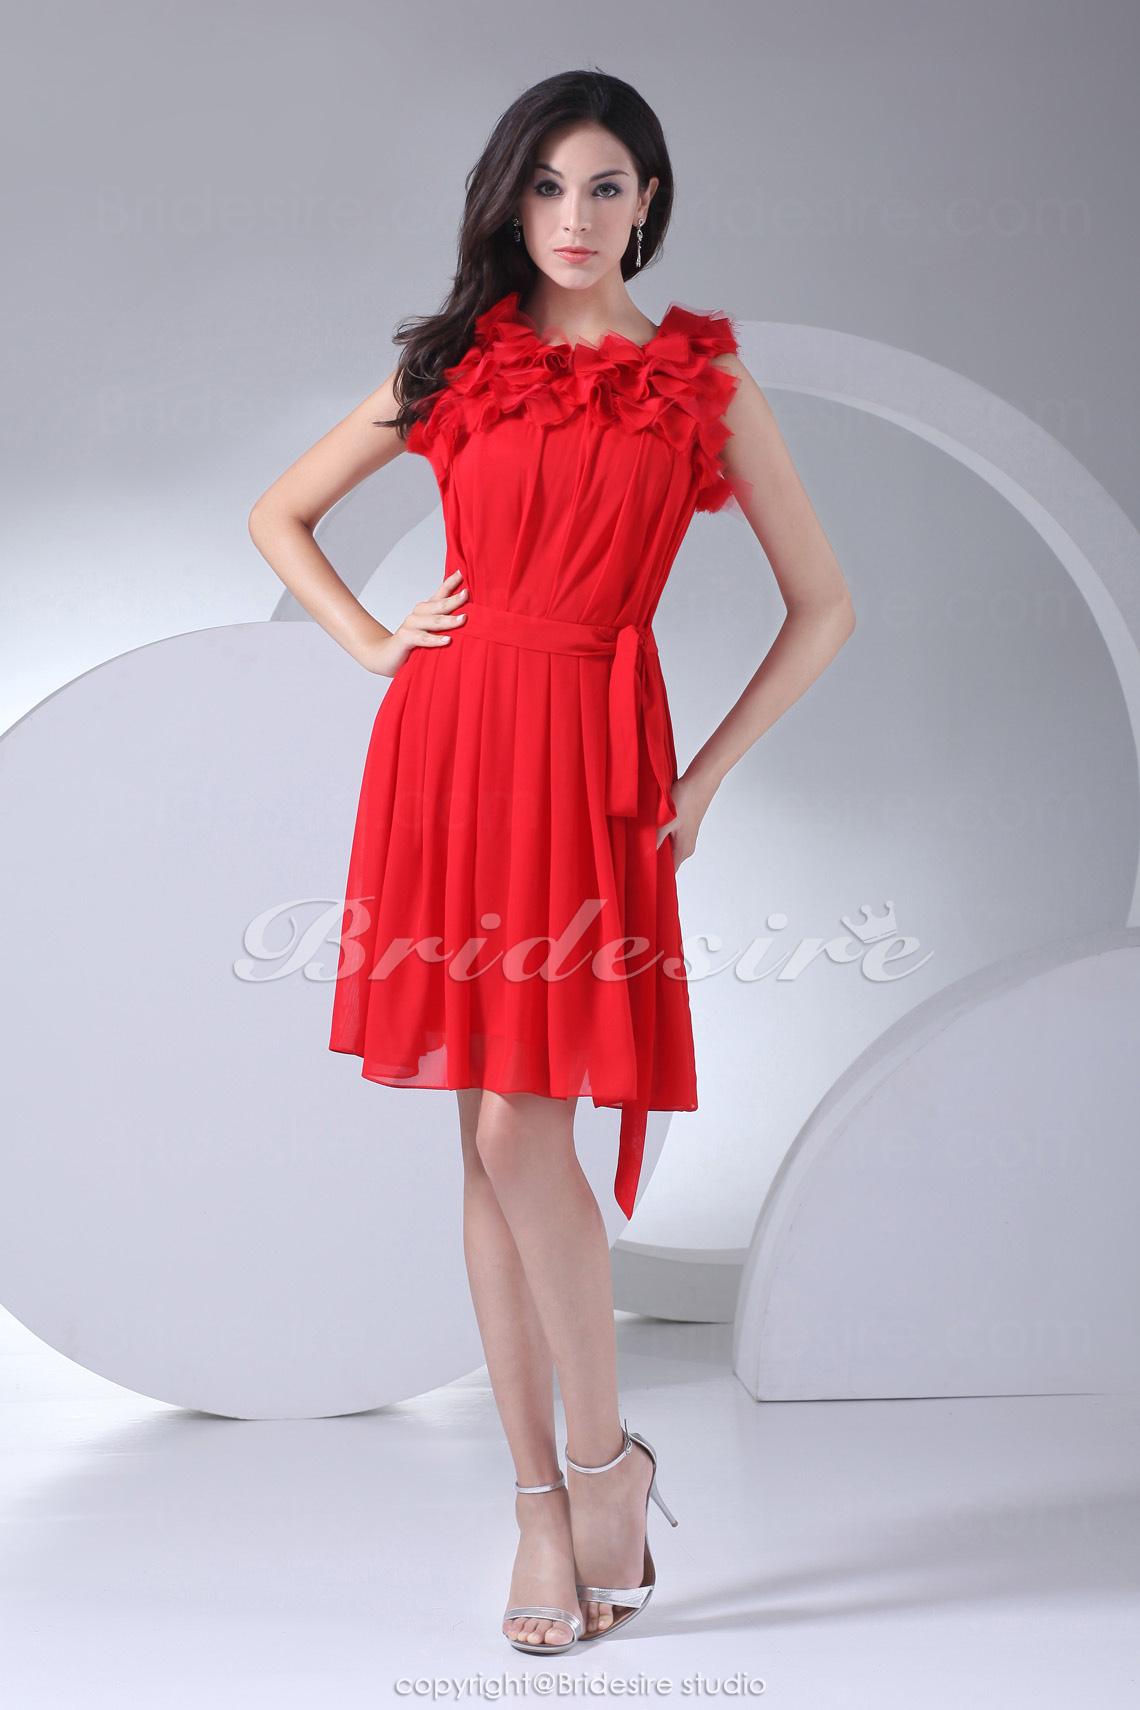 507ffed29843fb ... in soorten en maten. galajurken online kopen met een hoge kwaliteit en  snel levering – goedkope gala jurk webwinkel